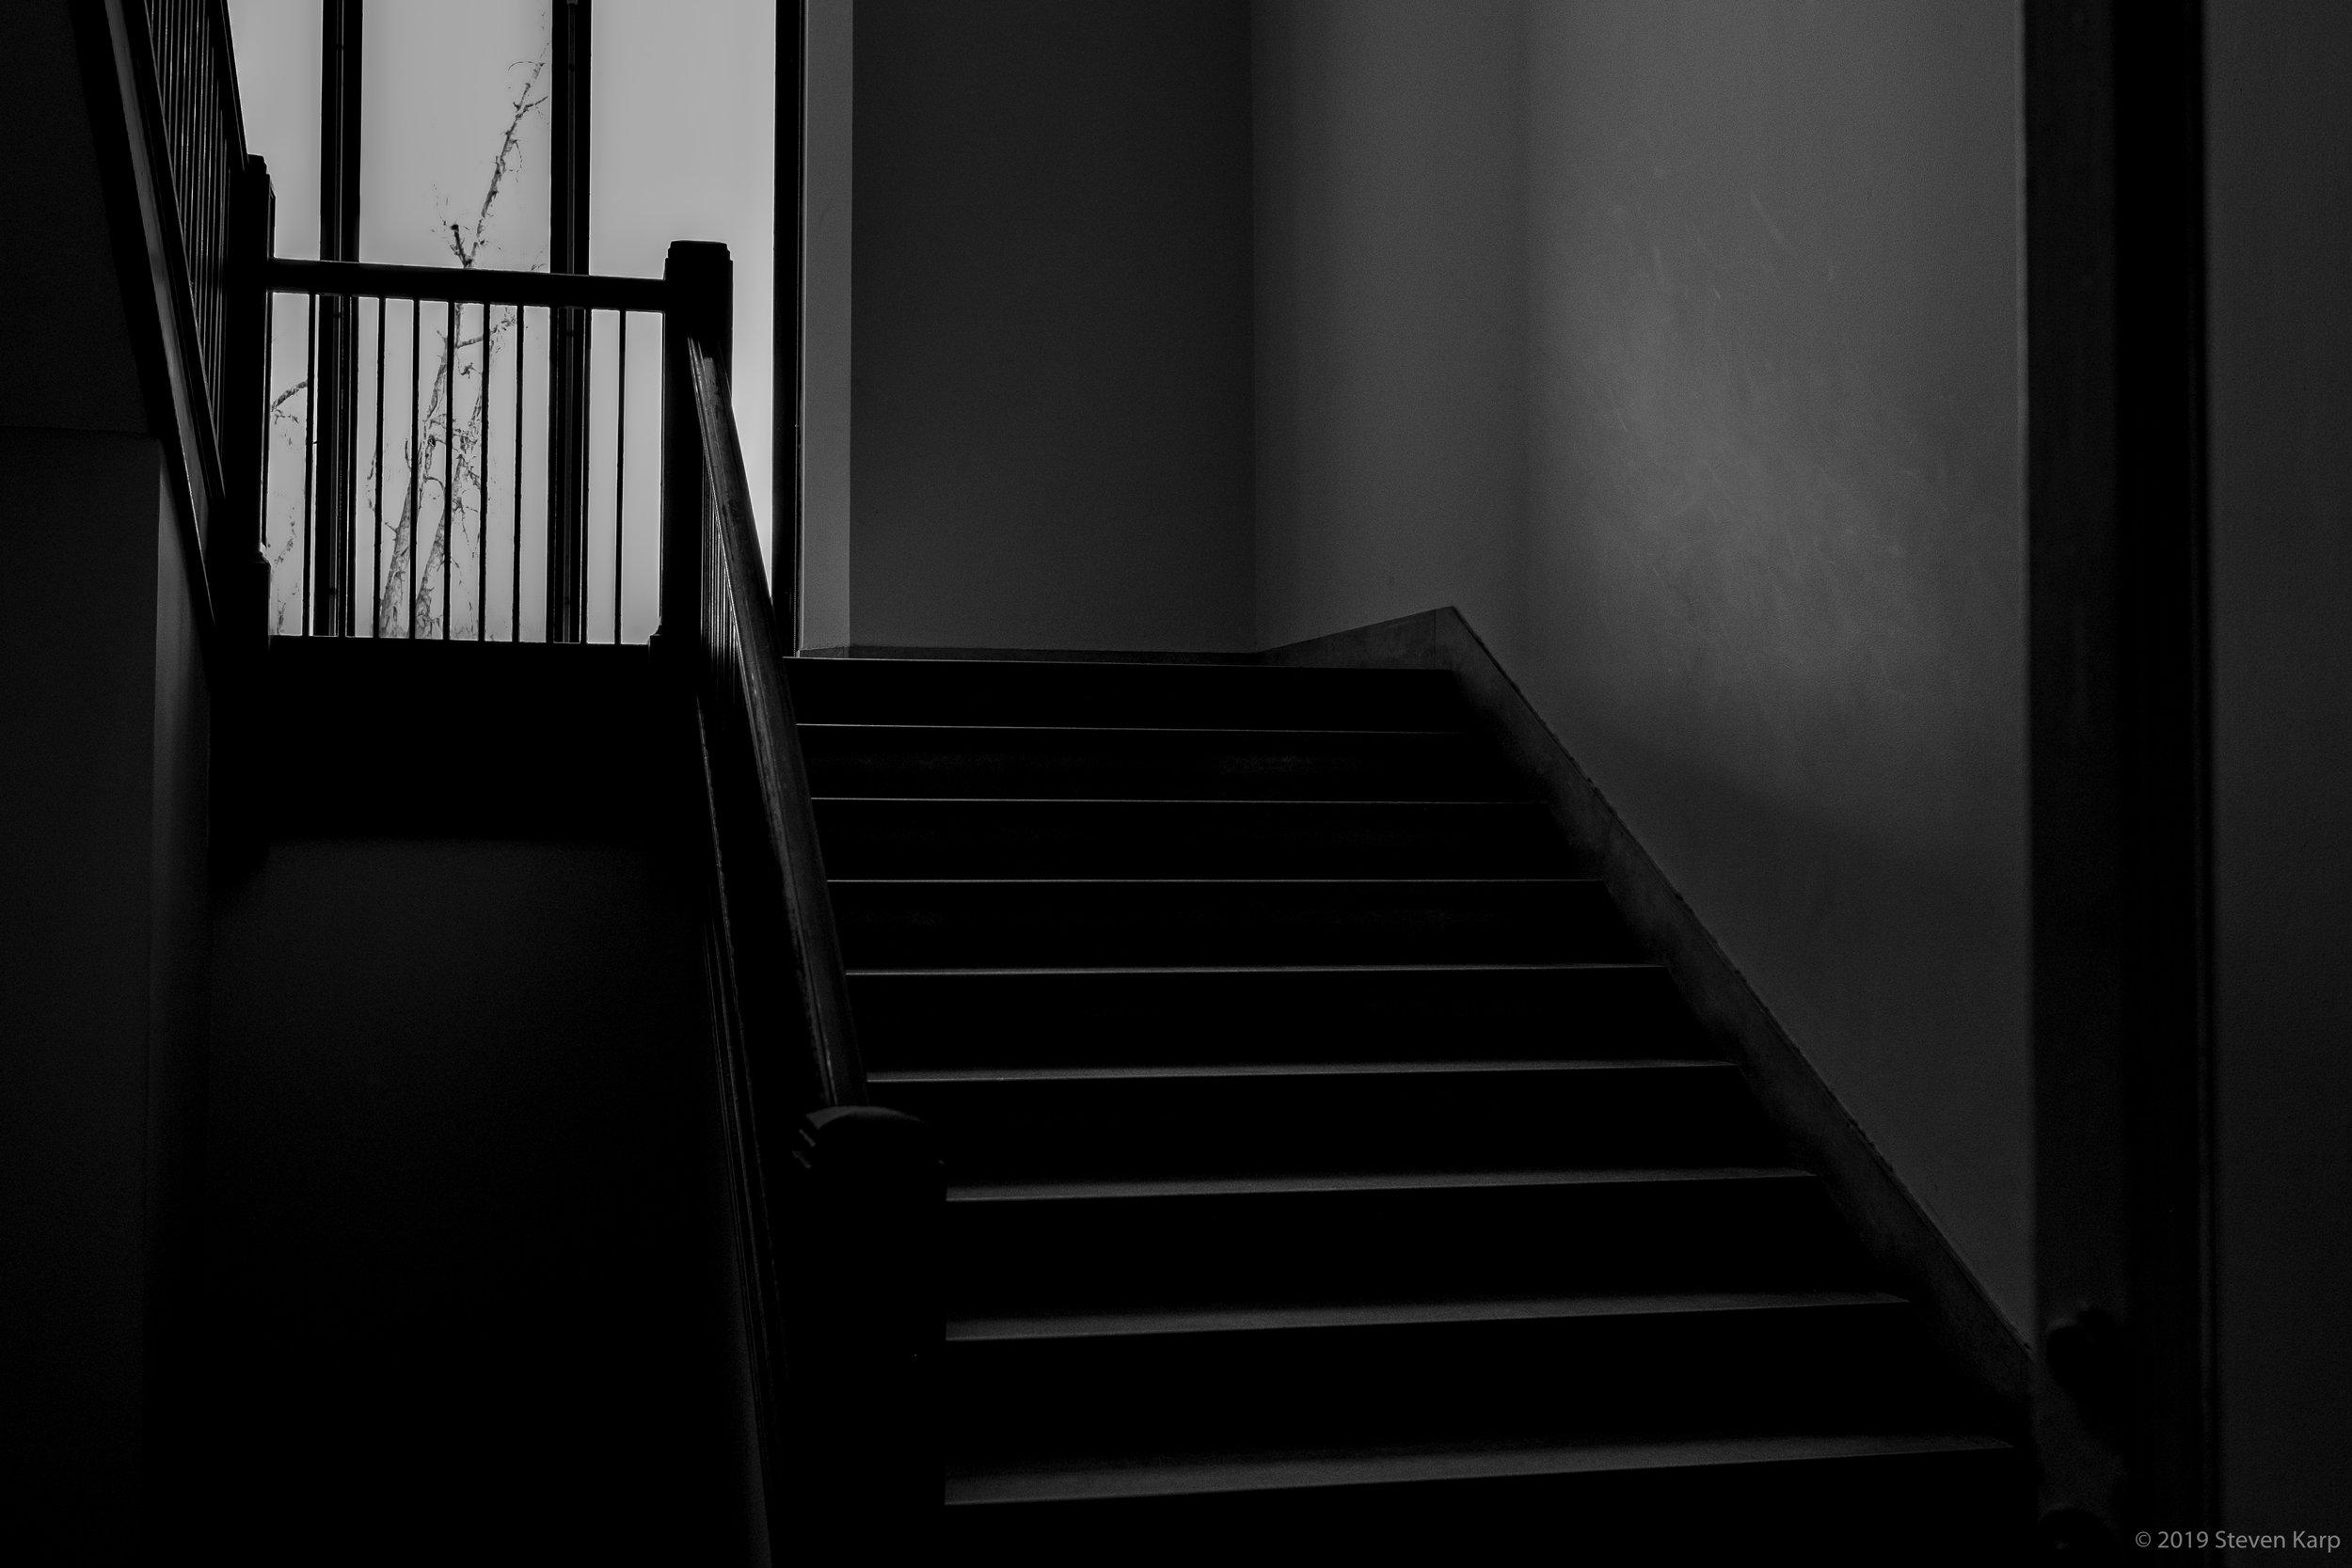 Lonely Staircase ©2019 Steven Karp